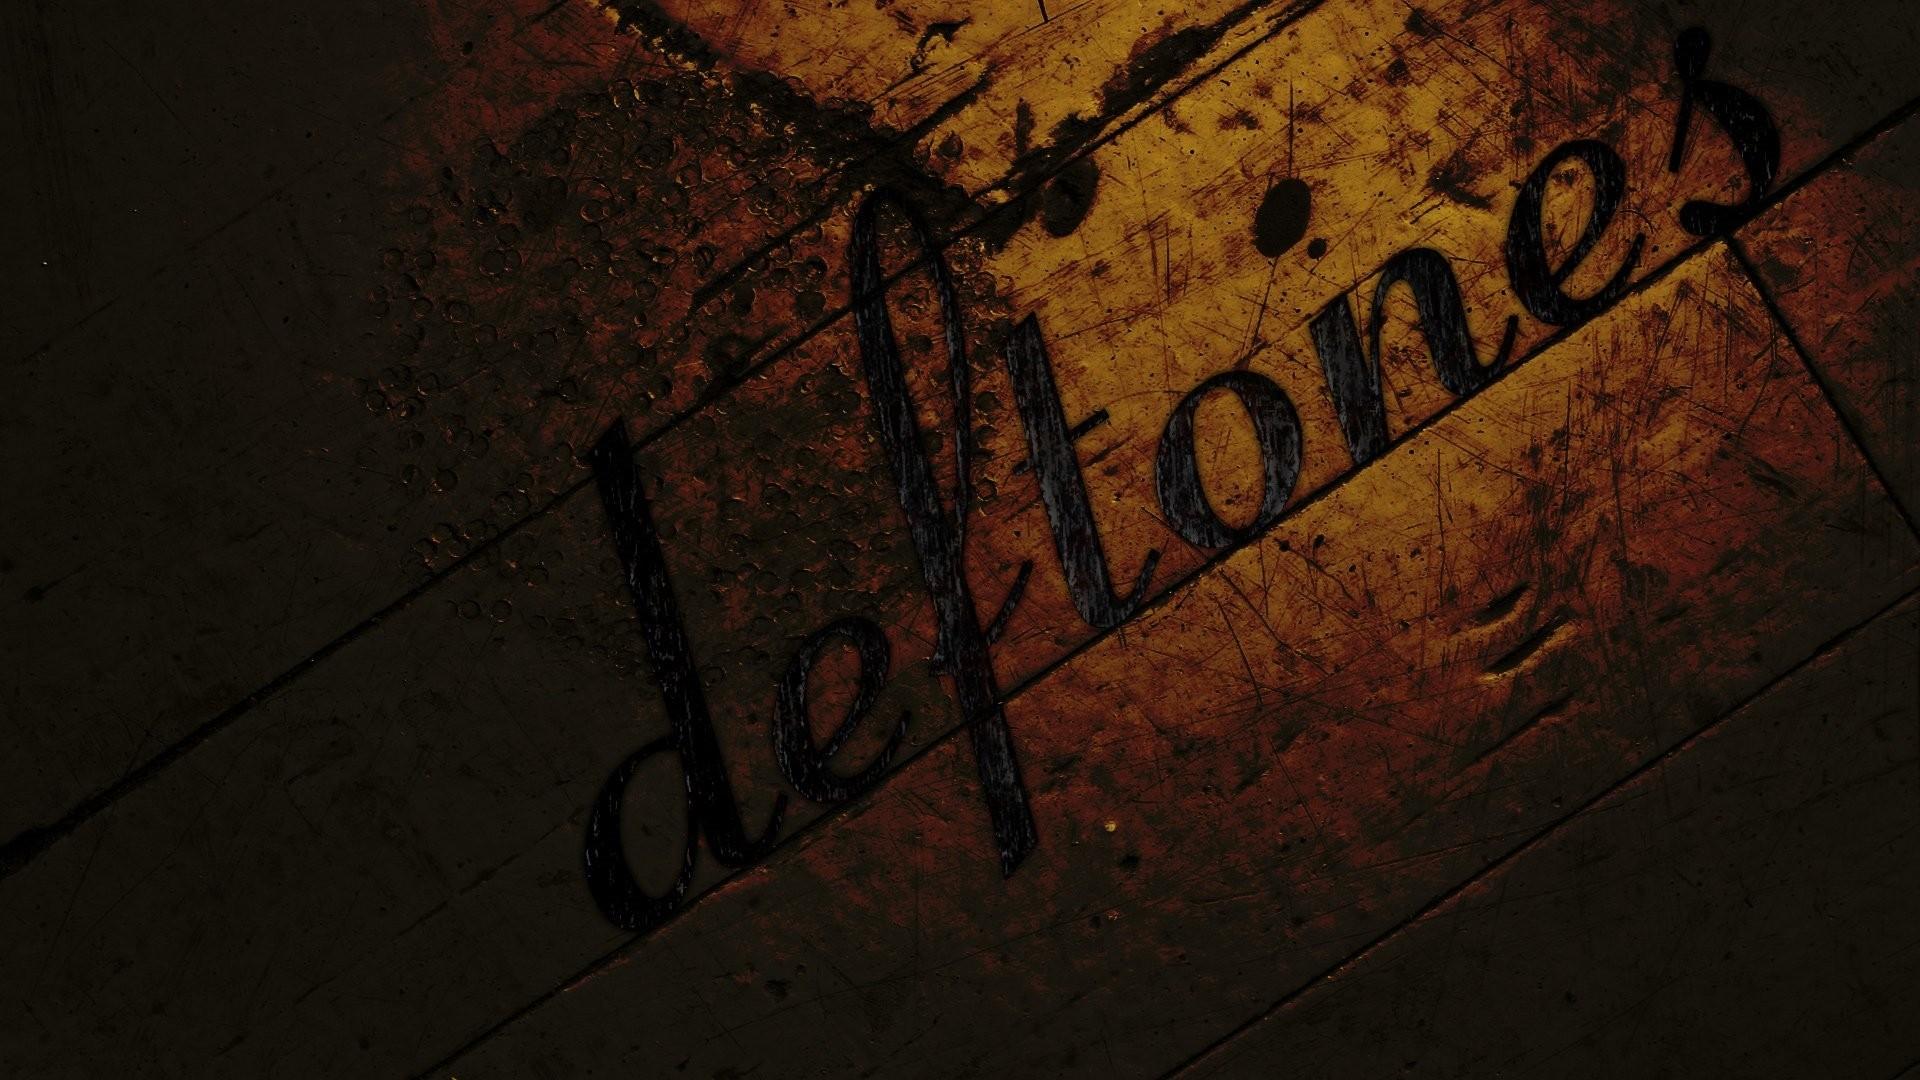 Deftones wallpaper image